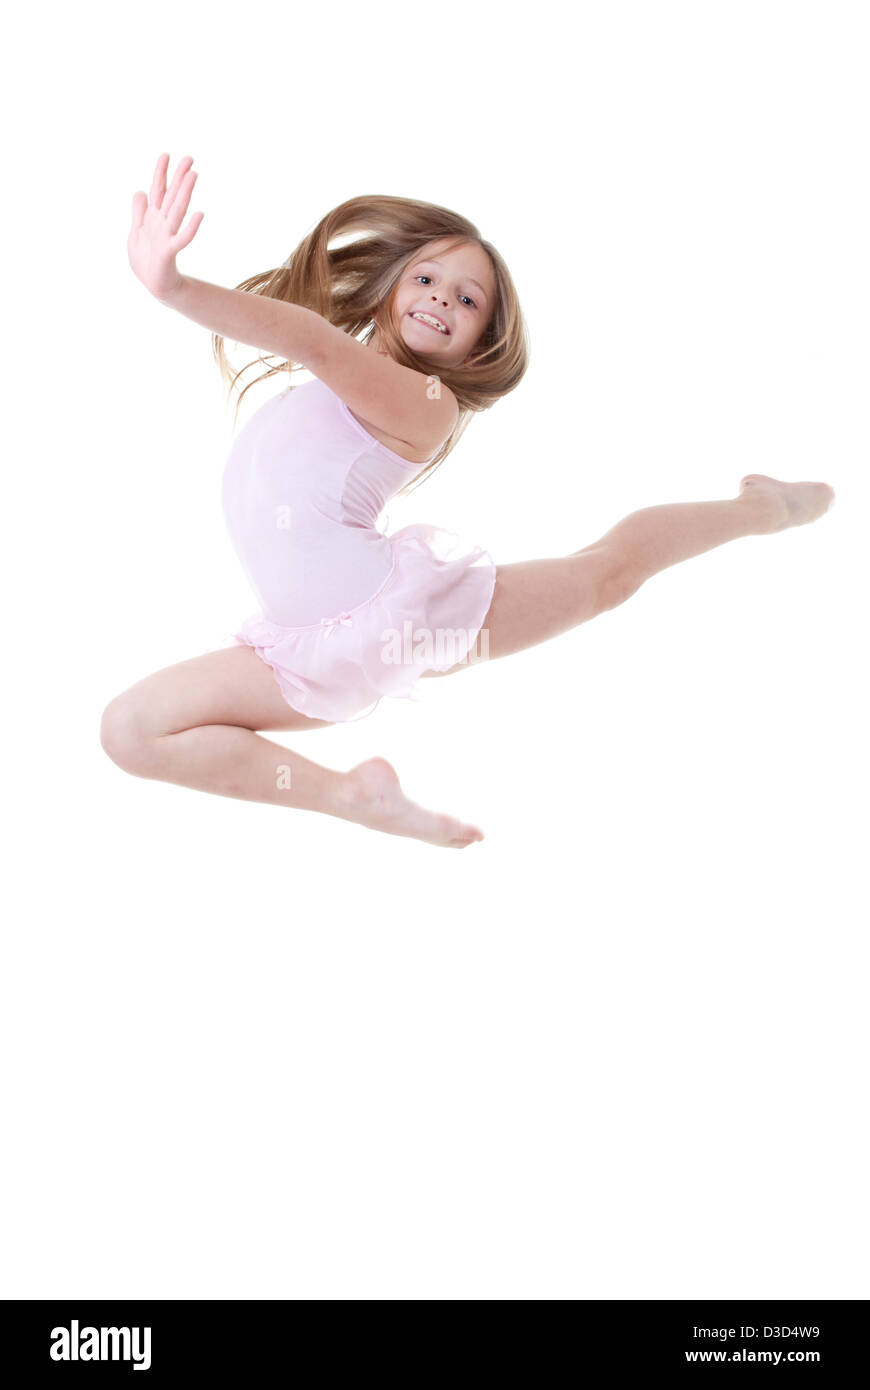 child ballet dancer leap or dance - Stock Image